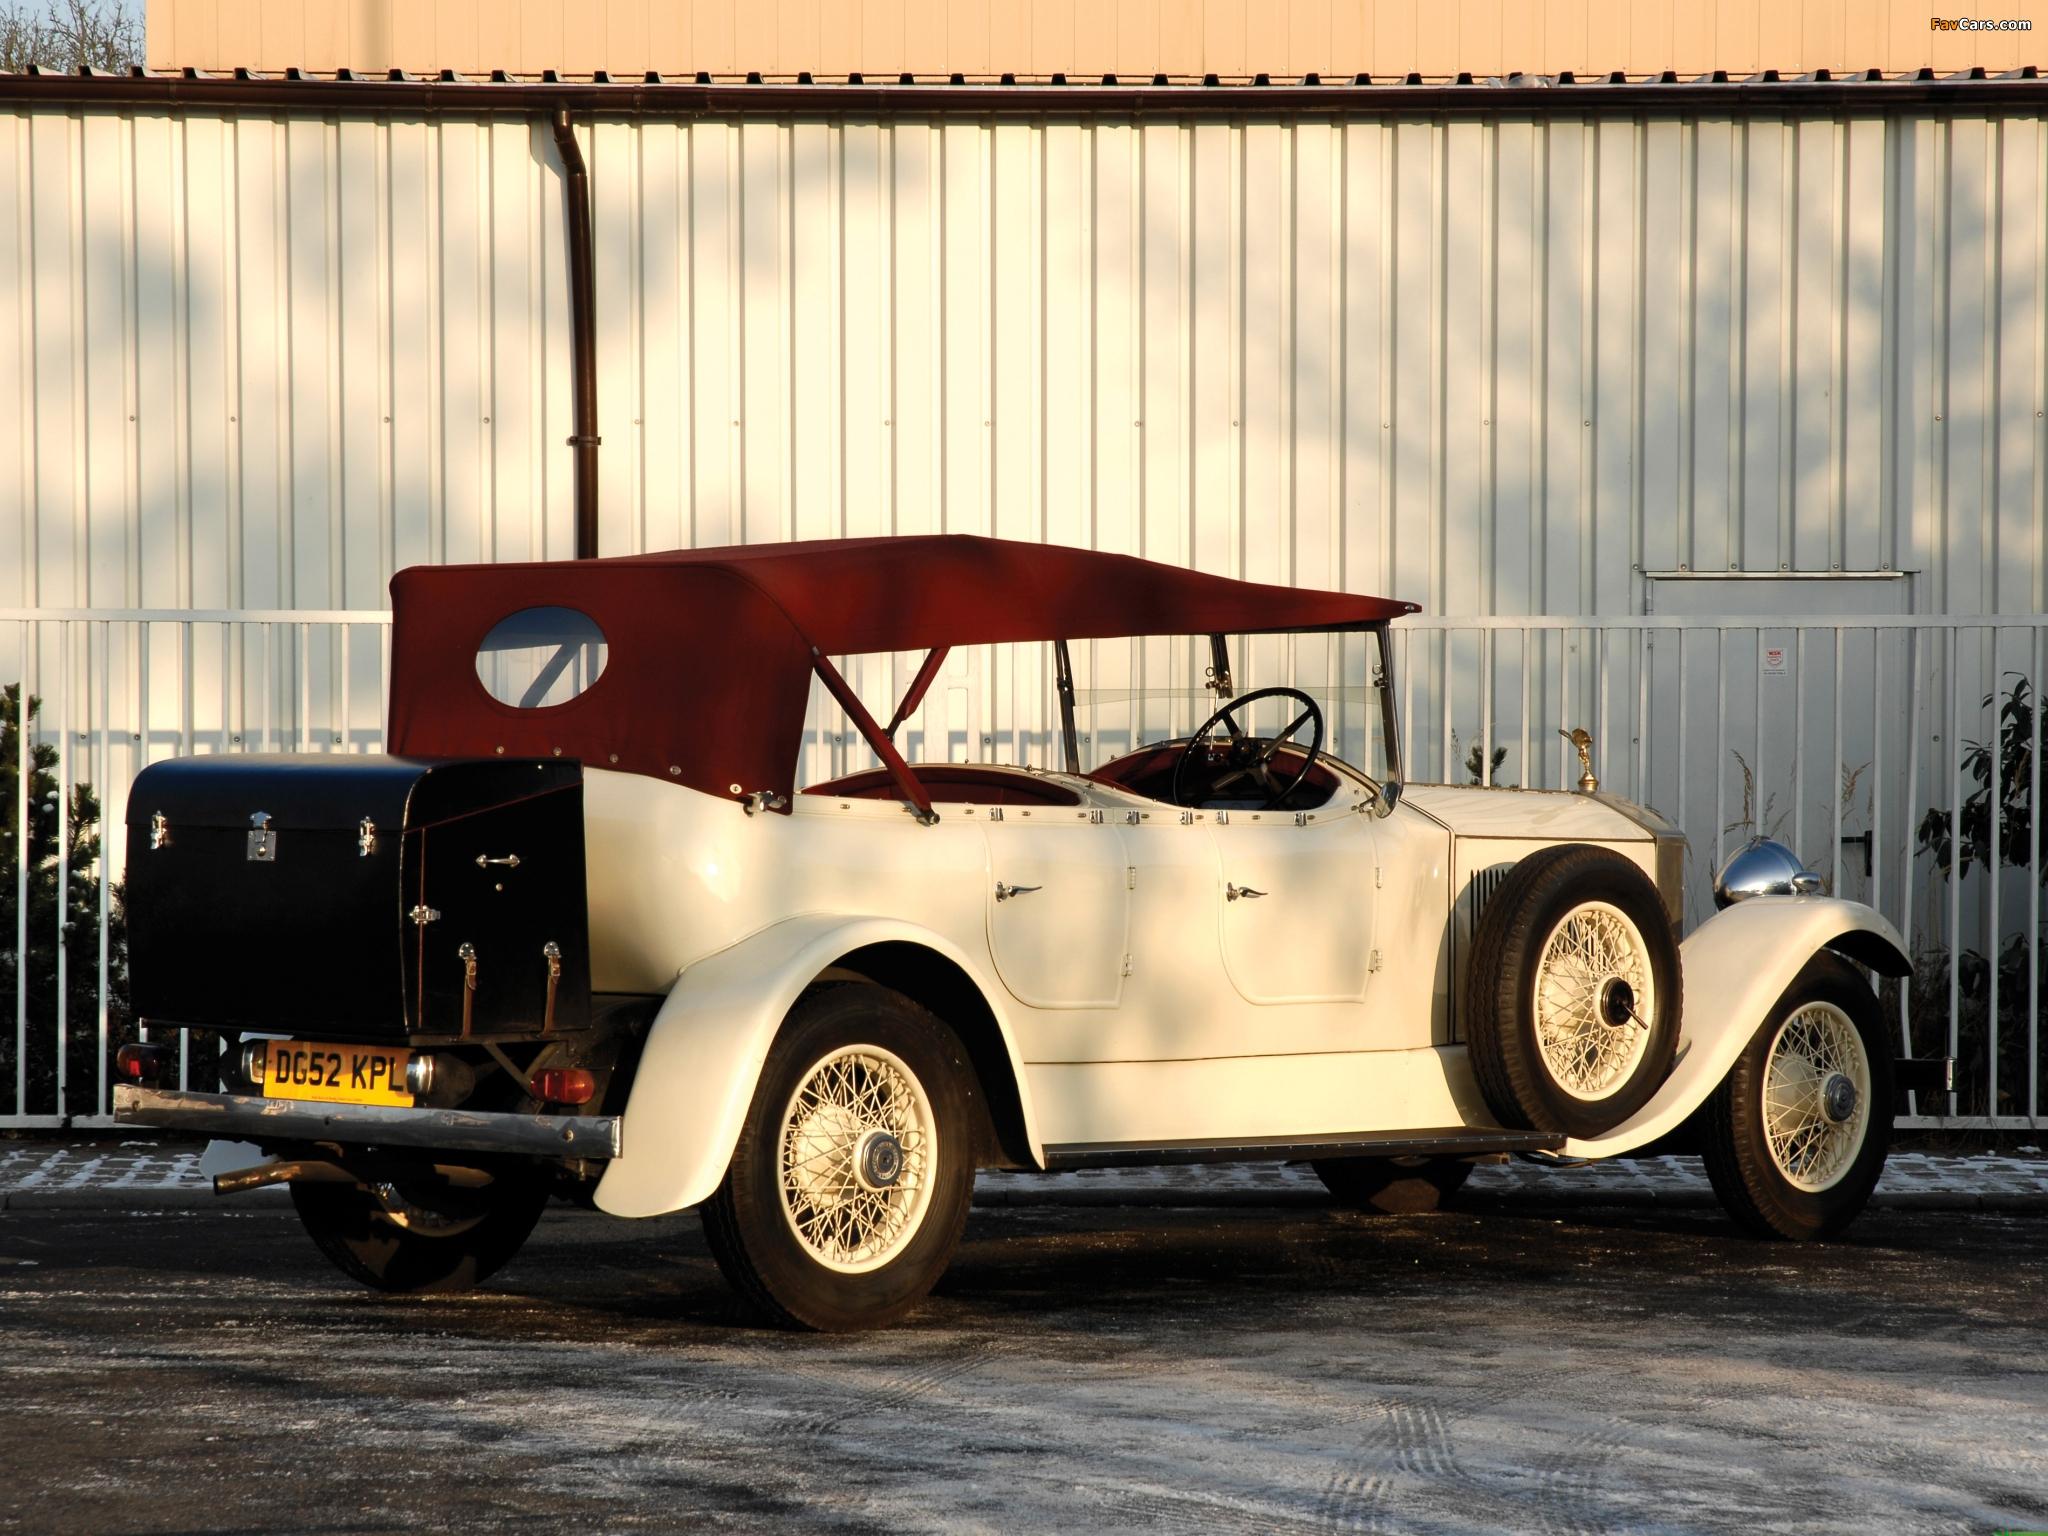 Rolls-Royce Phantom II 40/50 HP Open Tourer 1929 photos (2048 x 1536)